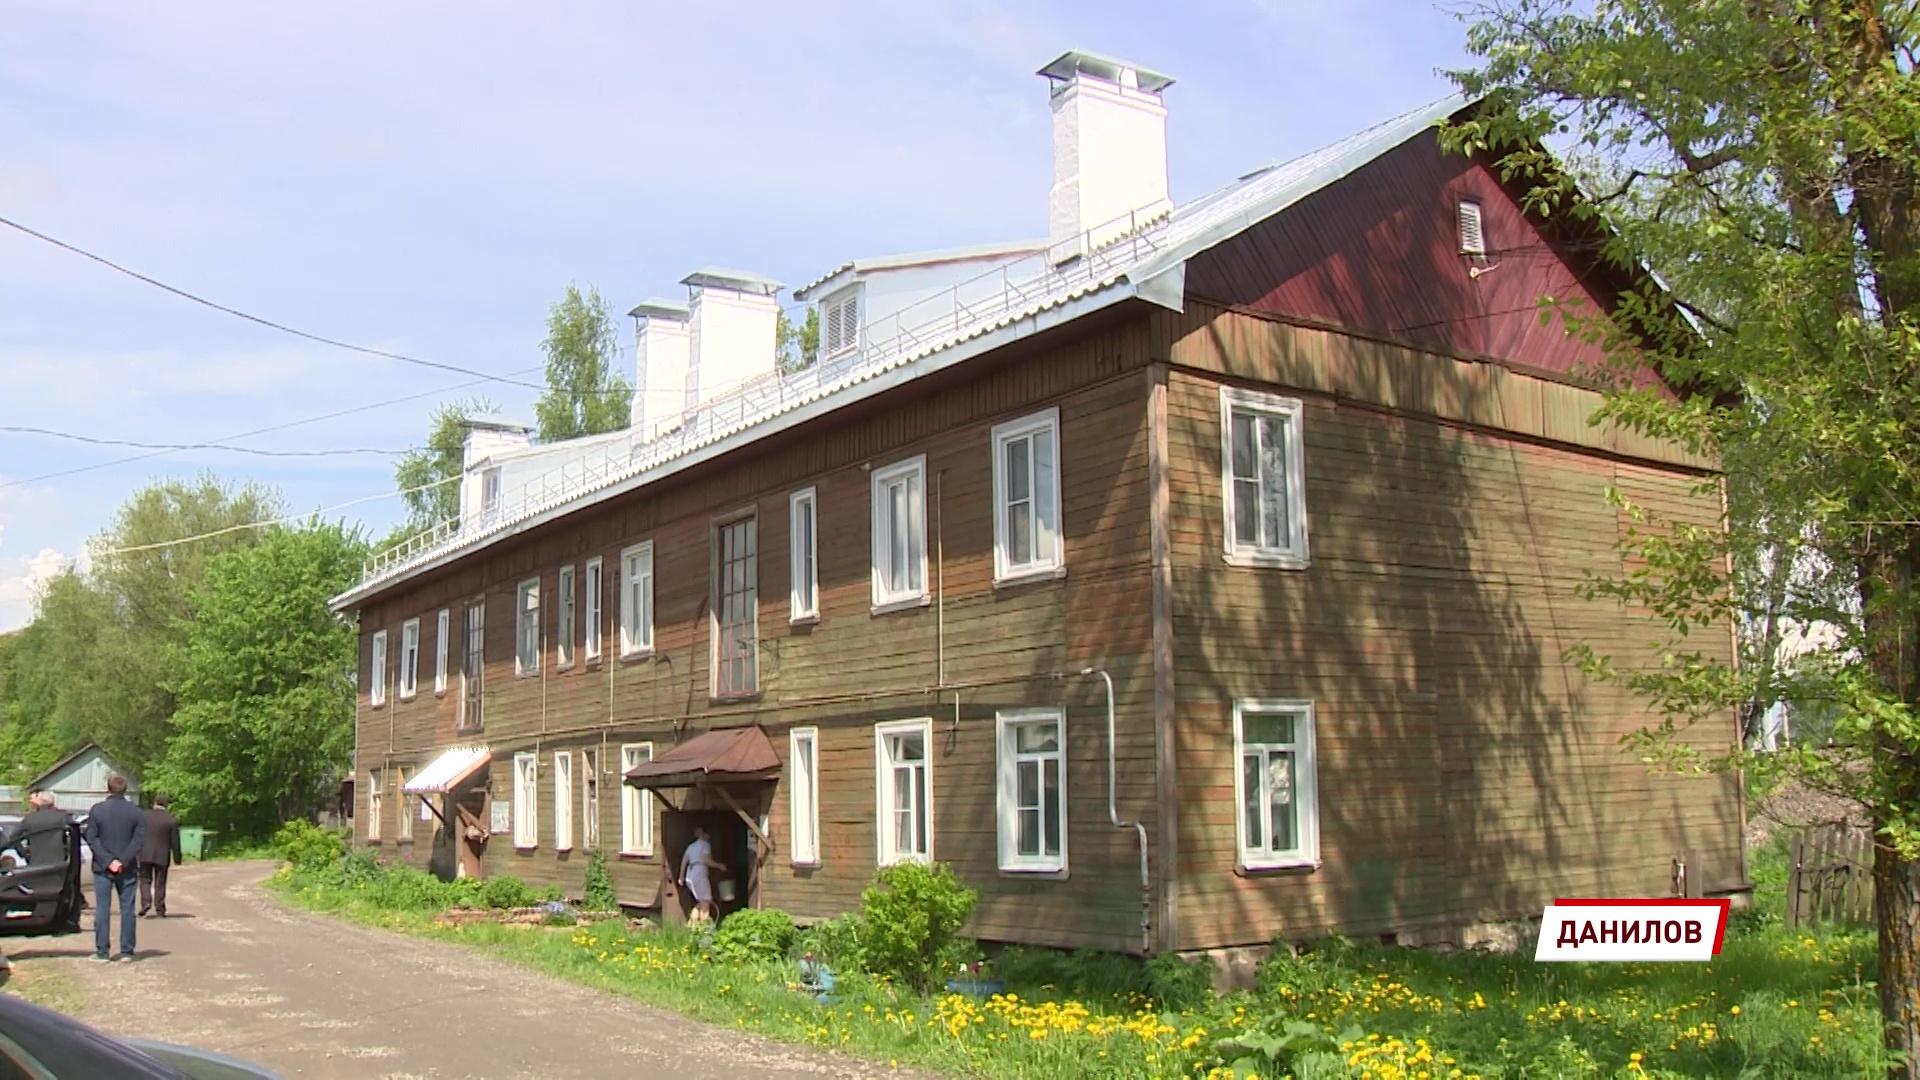 Комиссия проверила ход капремонта домов в Данилове